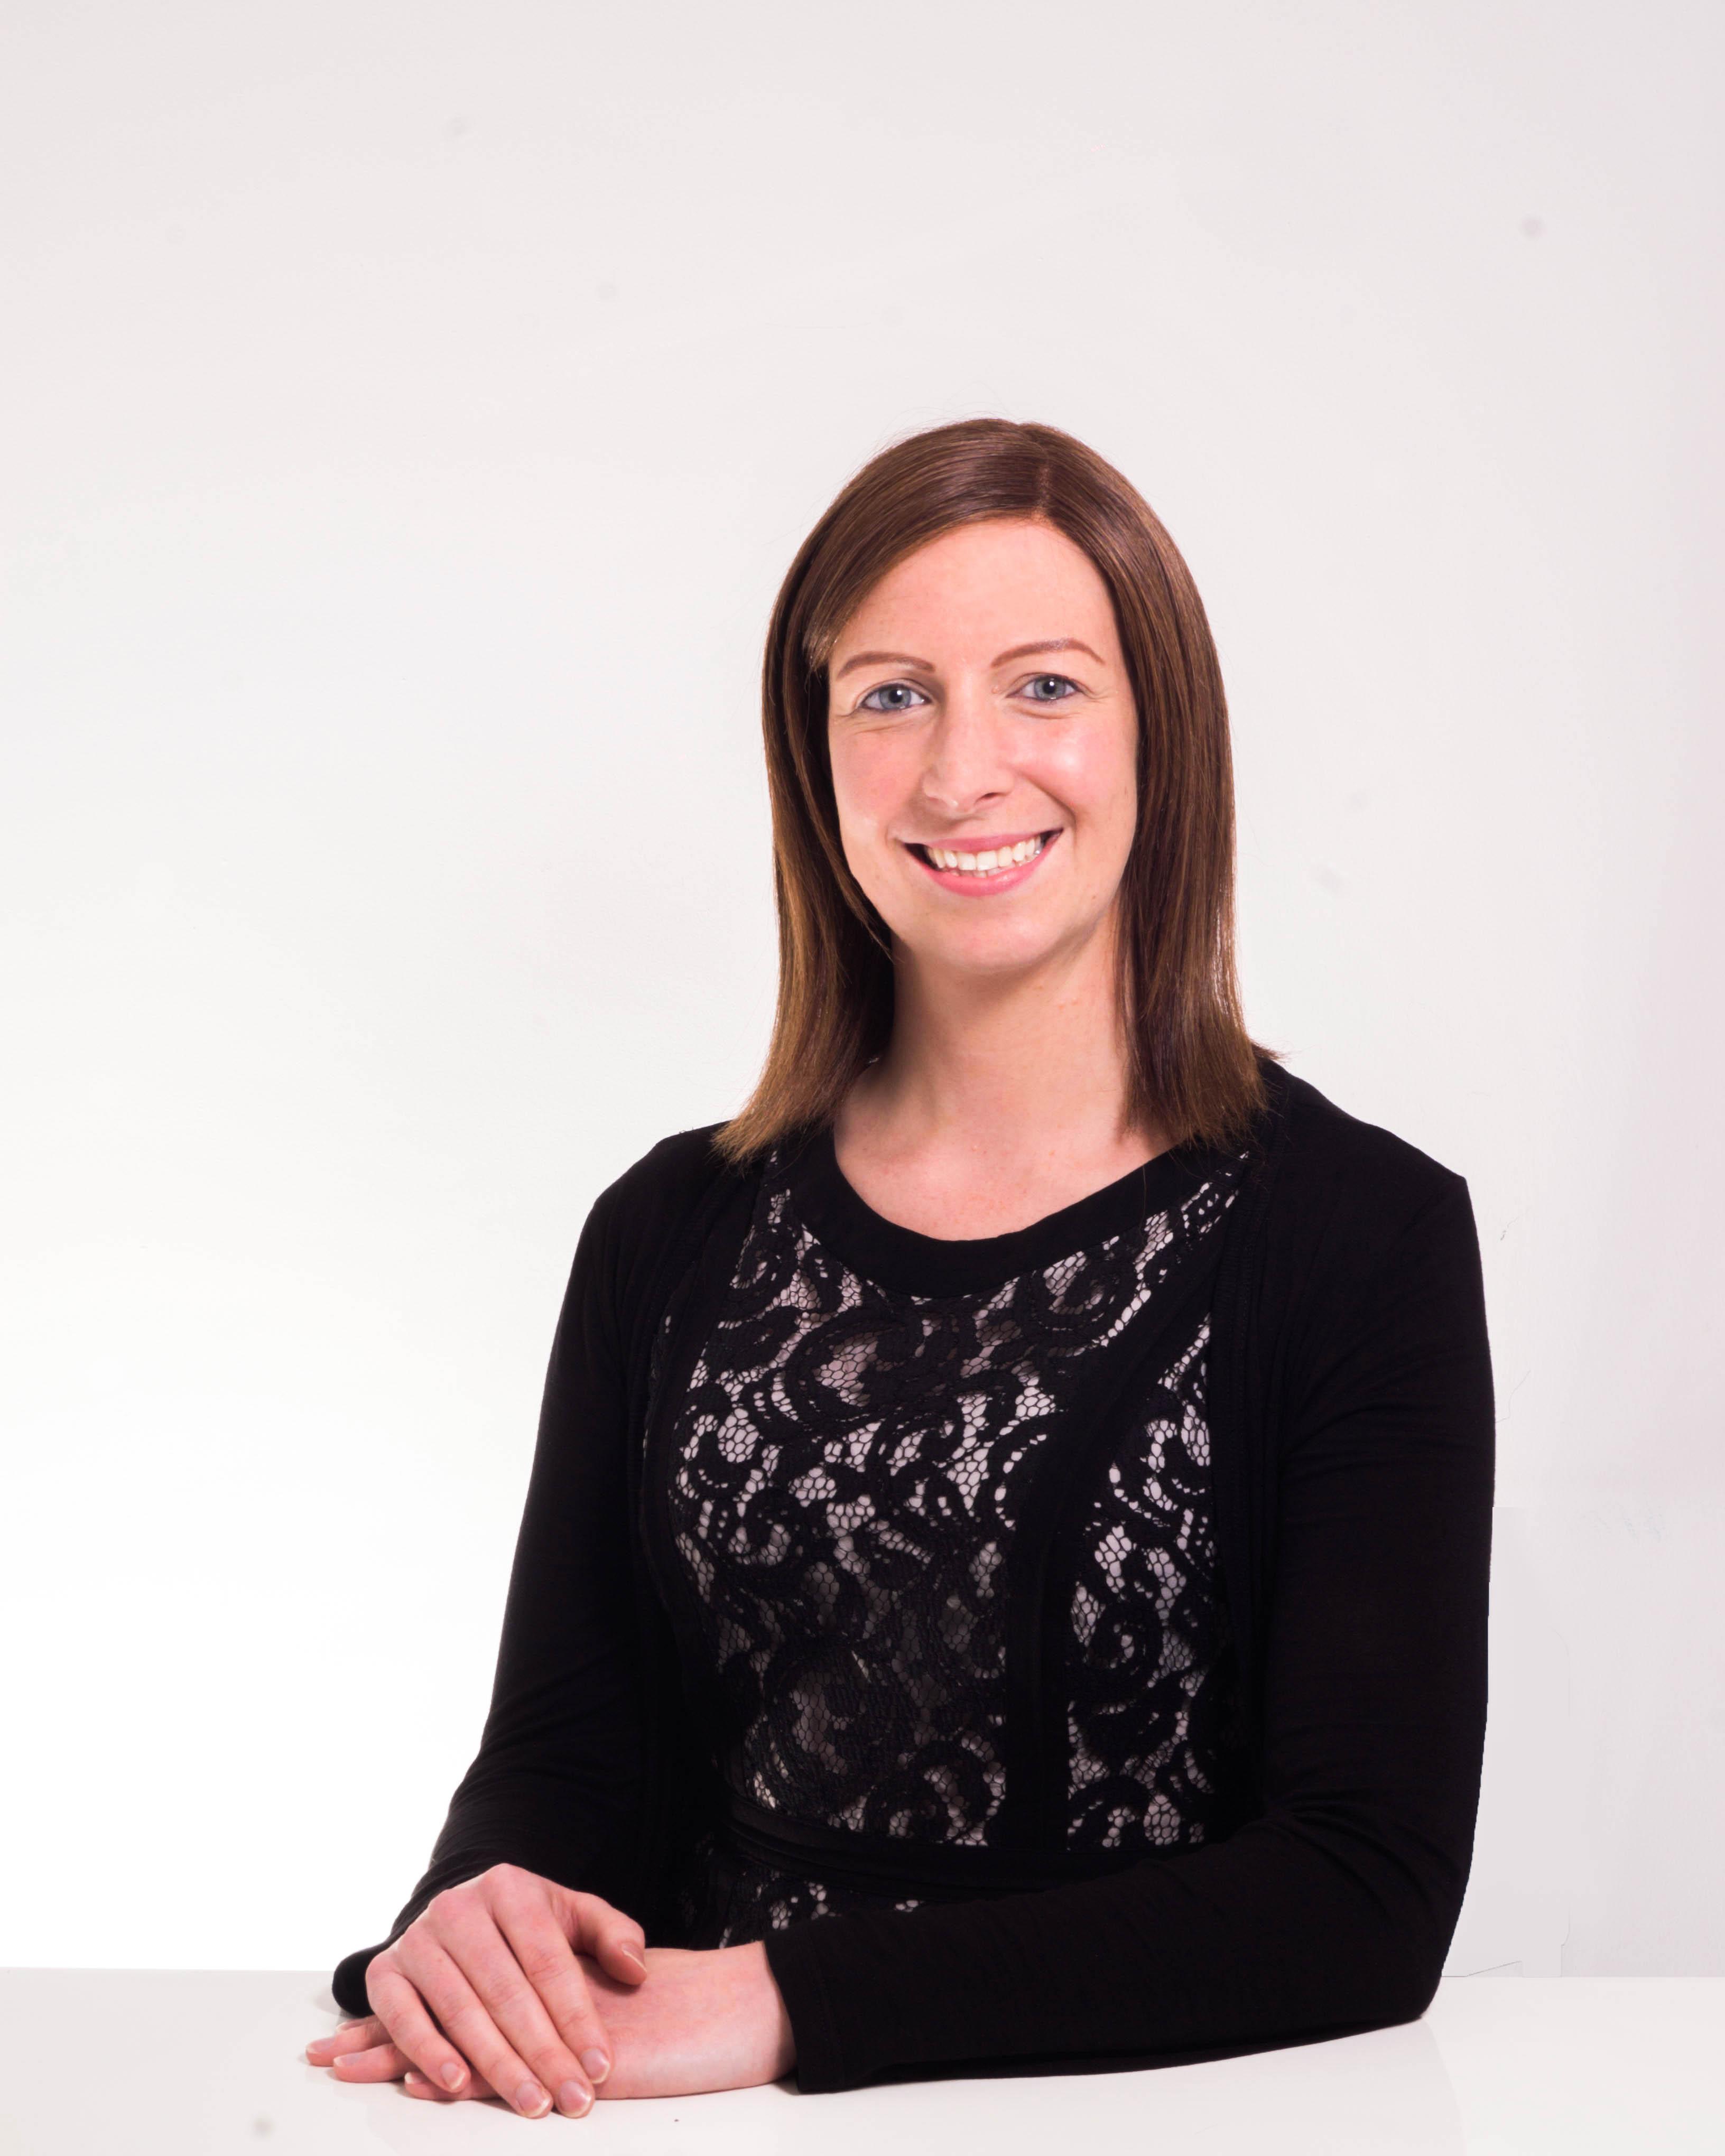 FlowForma - Aoife Harte, Financial Controller and Business Process Expert